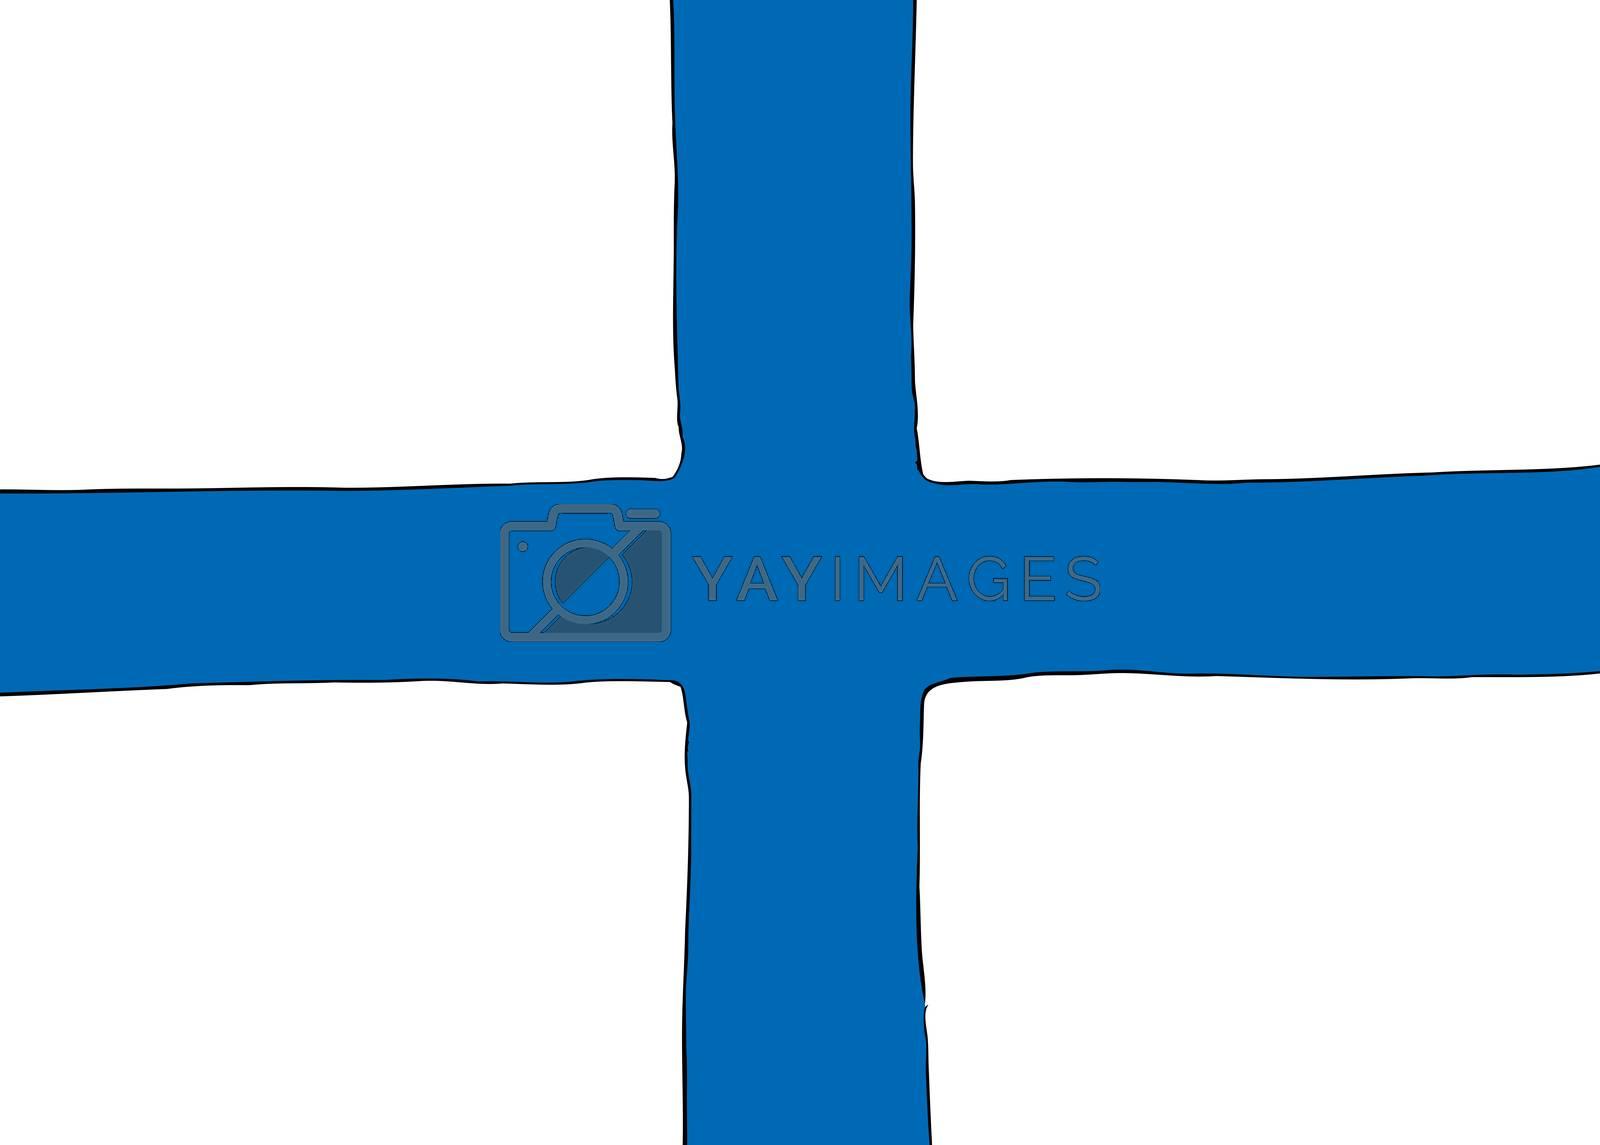 Symmetrical centered version of a Nordic Cross flag reprsenting Finland